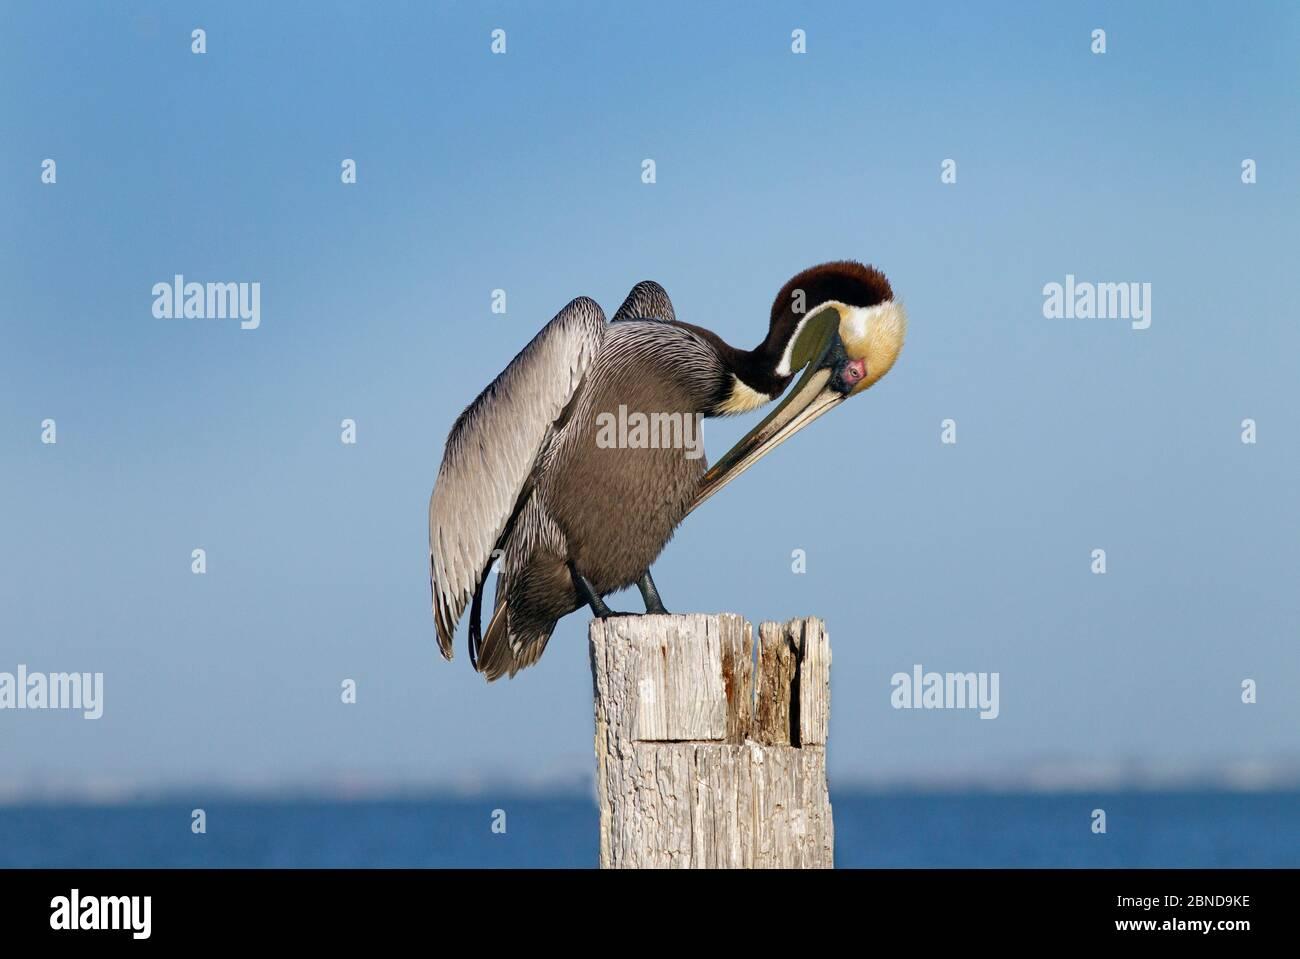 Brown pelican (Pelecanus occidentalis) preening on post, Gulf Coast, Florida, USA, MArch. Stock Photo